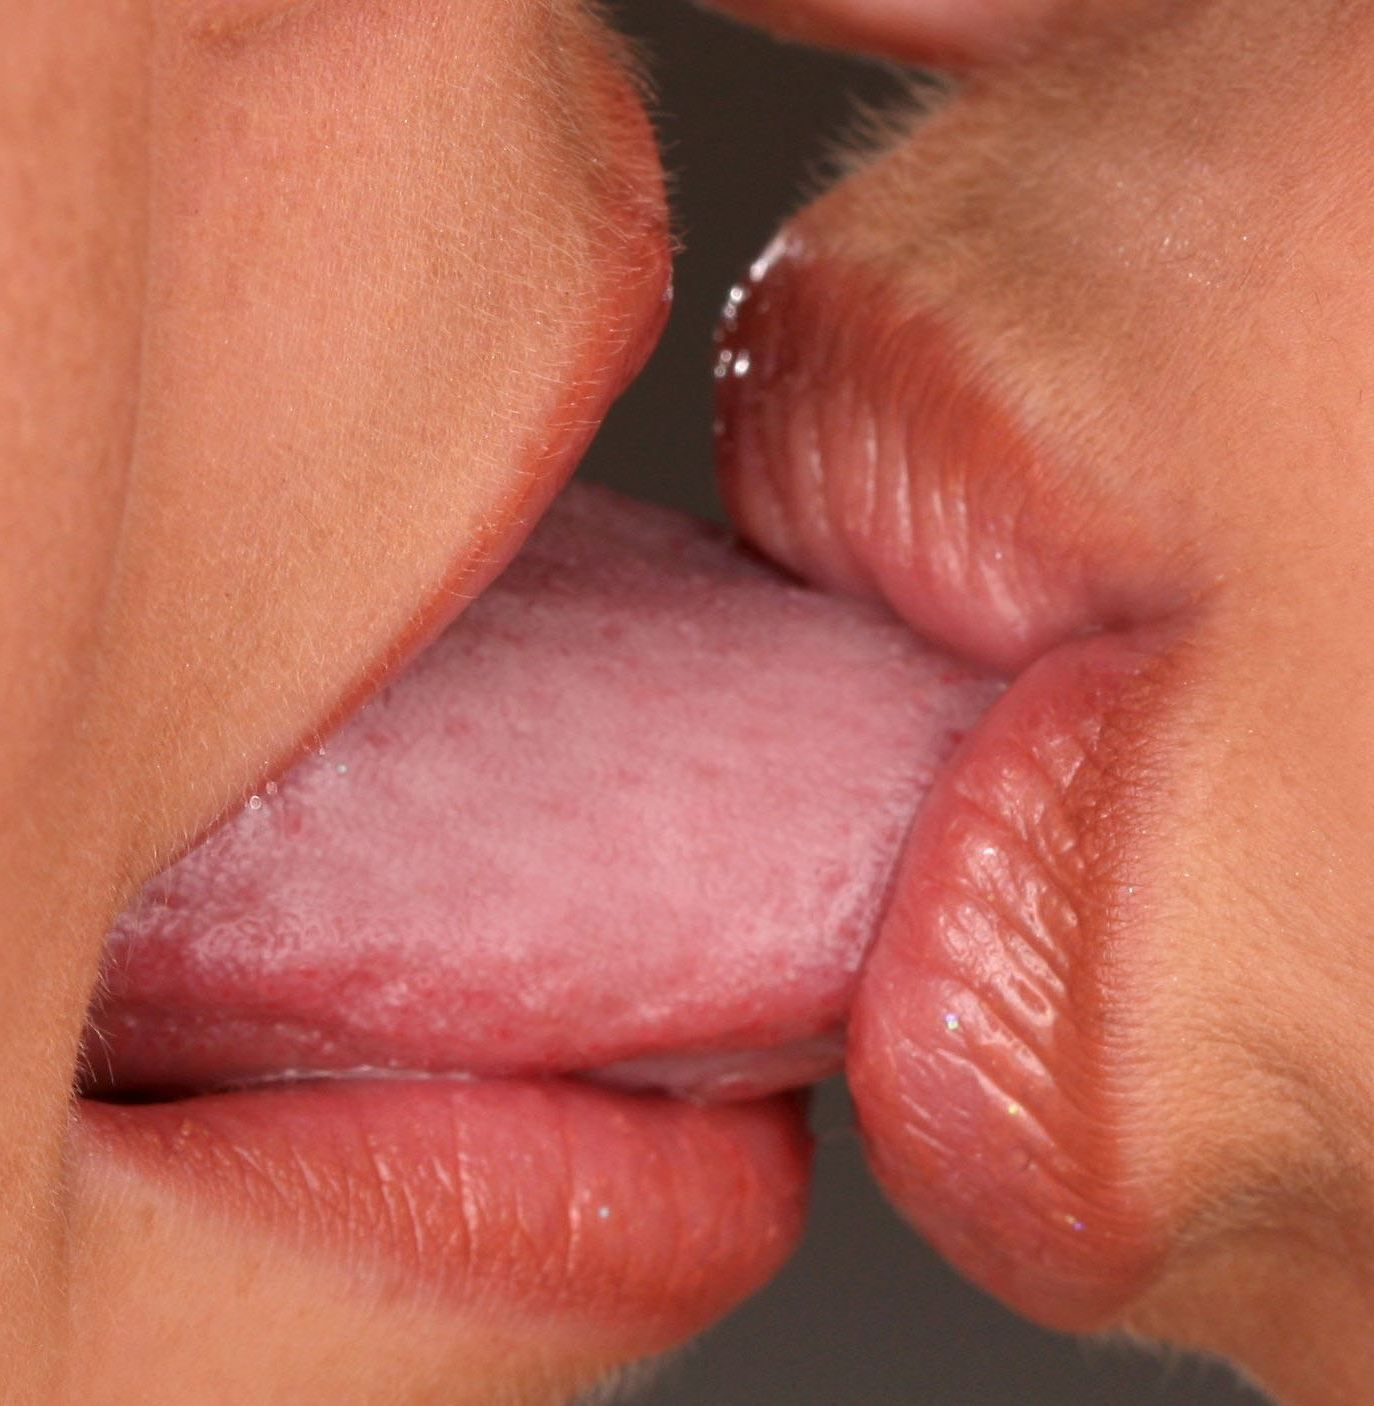 lesbian tongue kiss